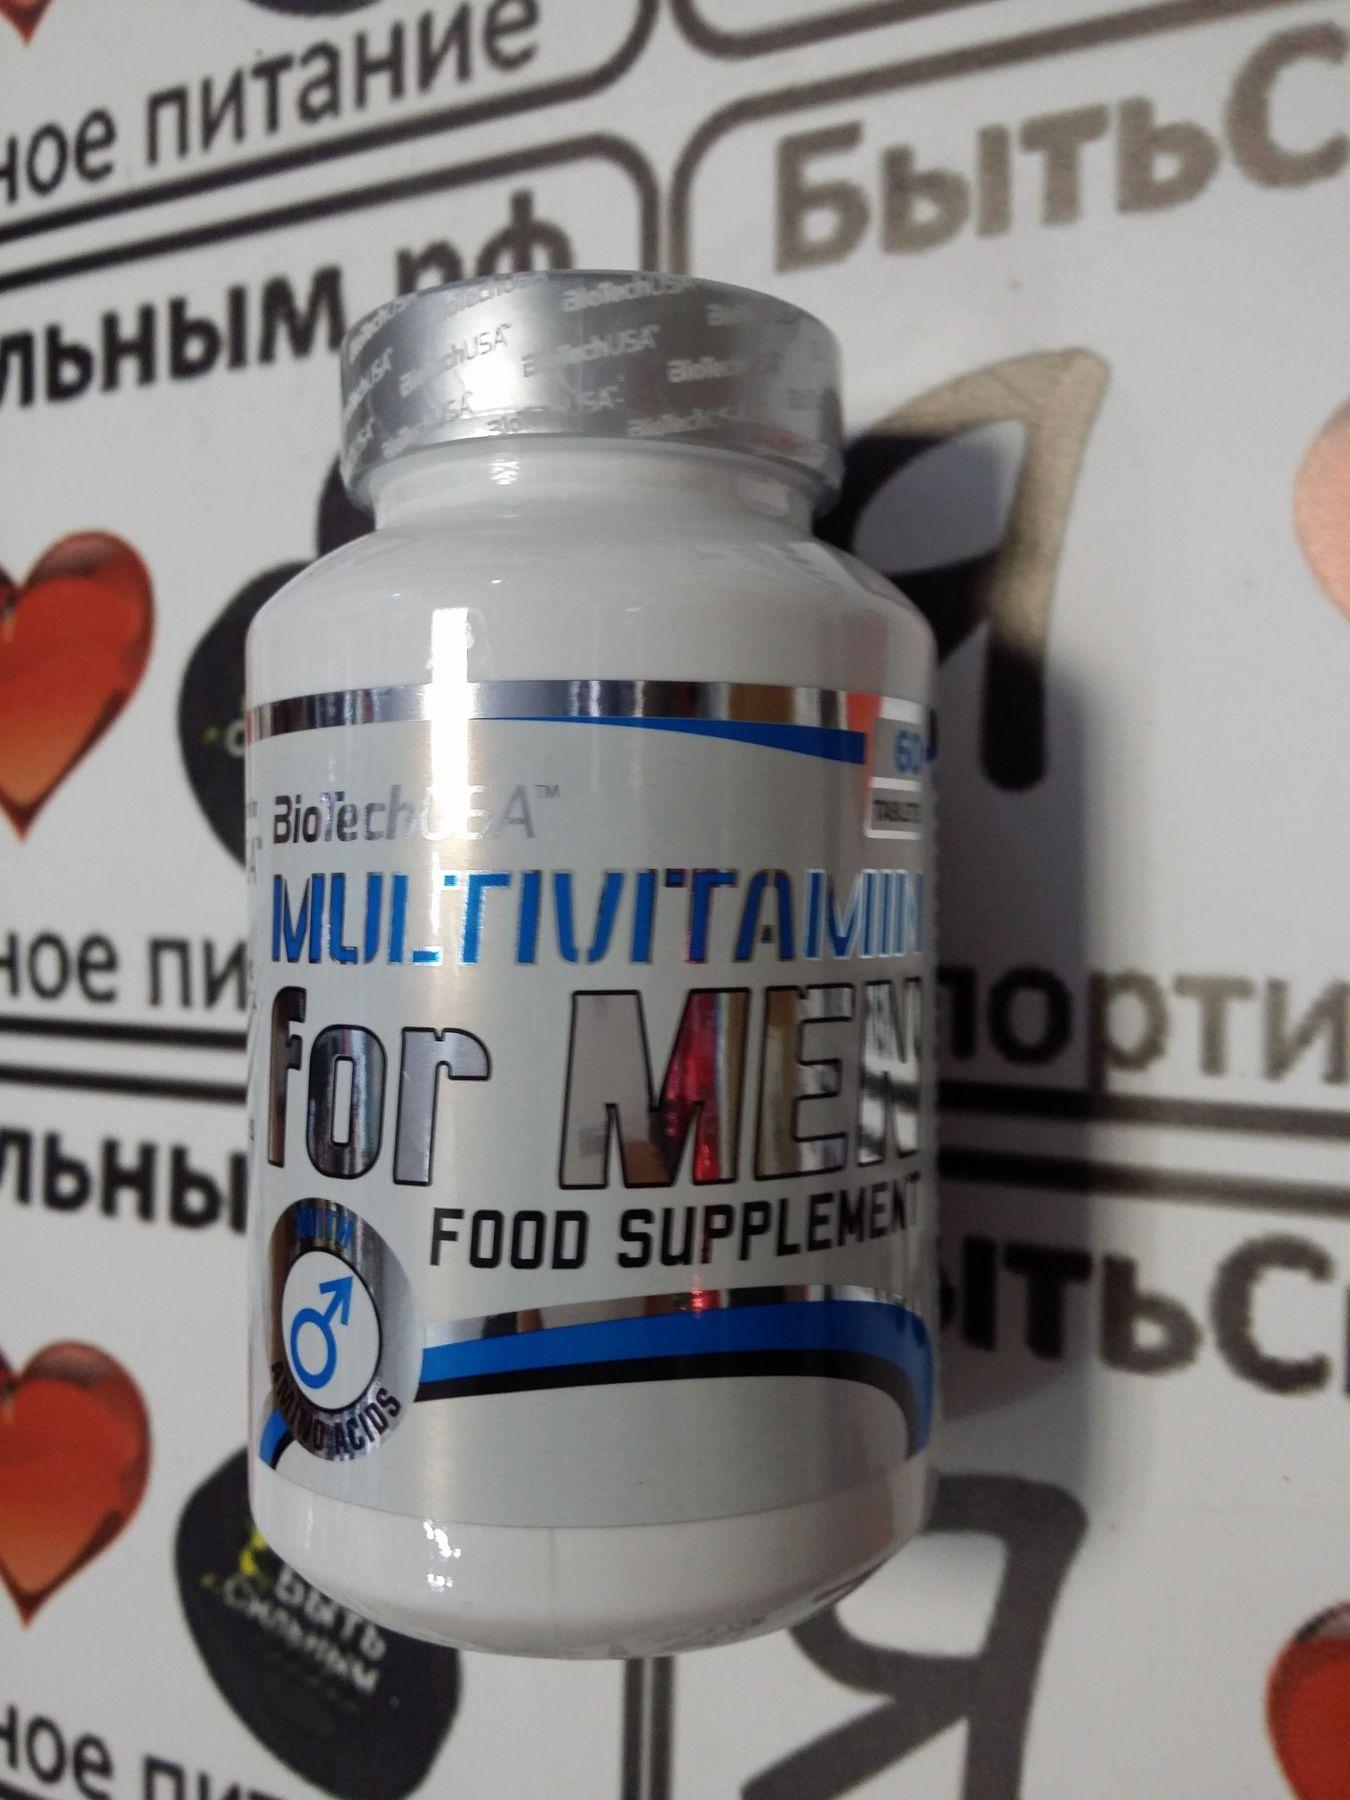 BioTech - Multivitaminl for Men